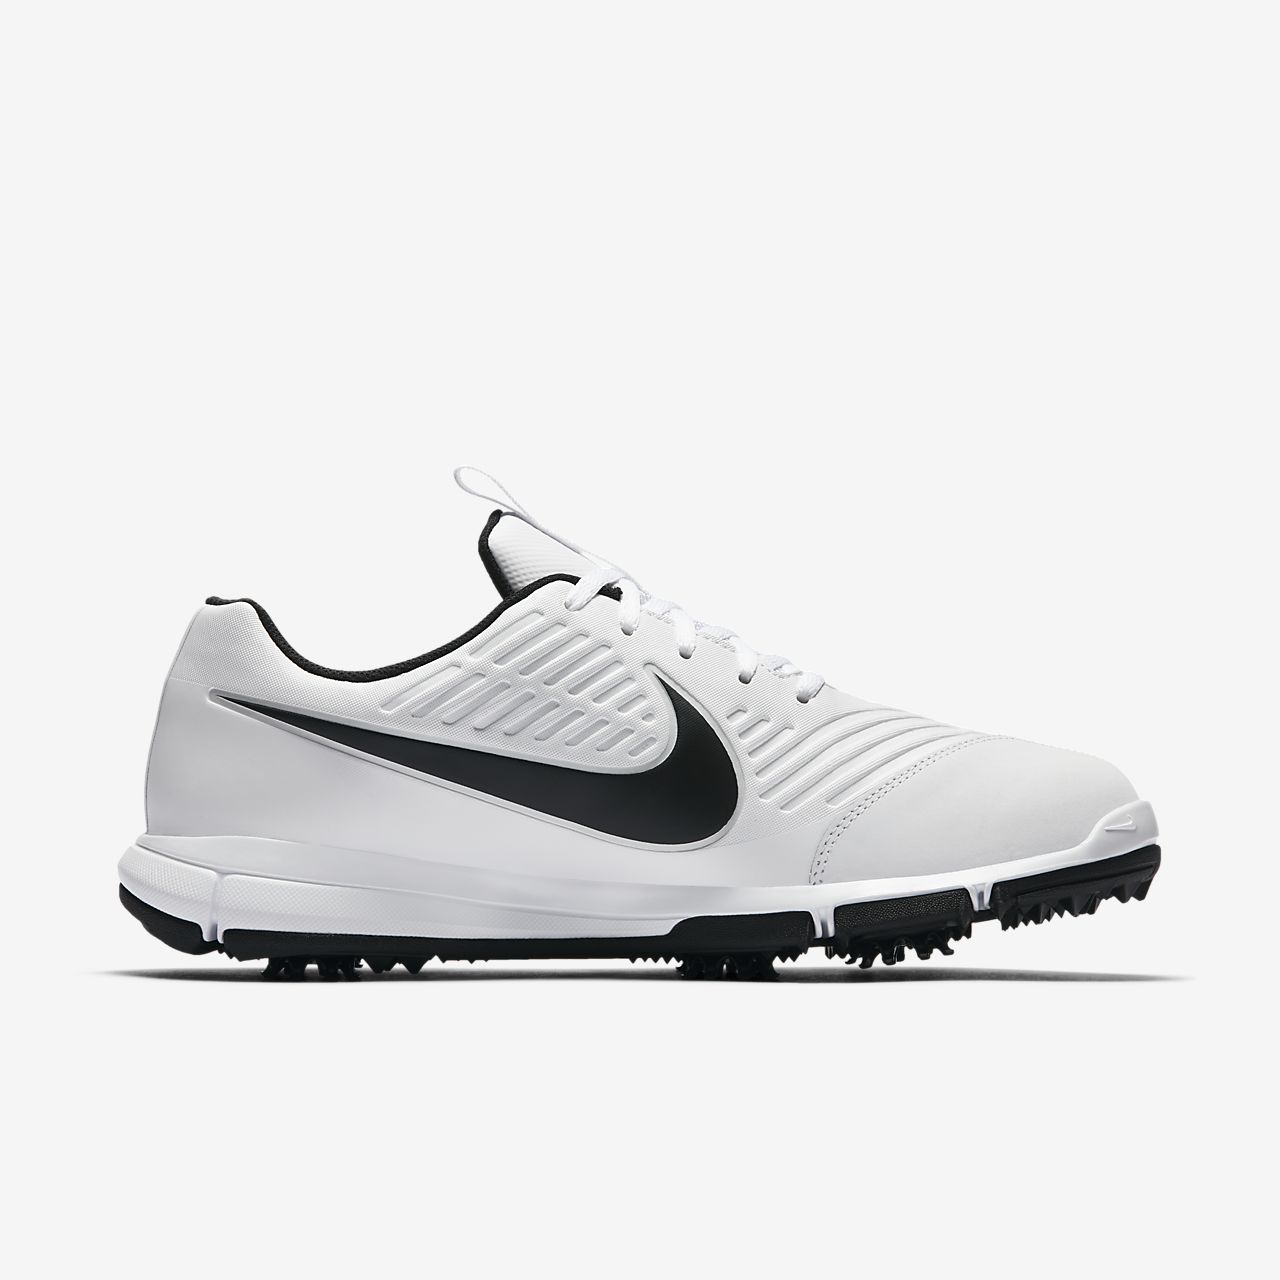 finest selection 9b672 7e603 ... Scarpa da golf Nike Explorer 2 S - Uomo